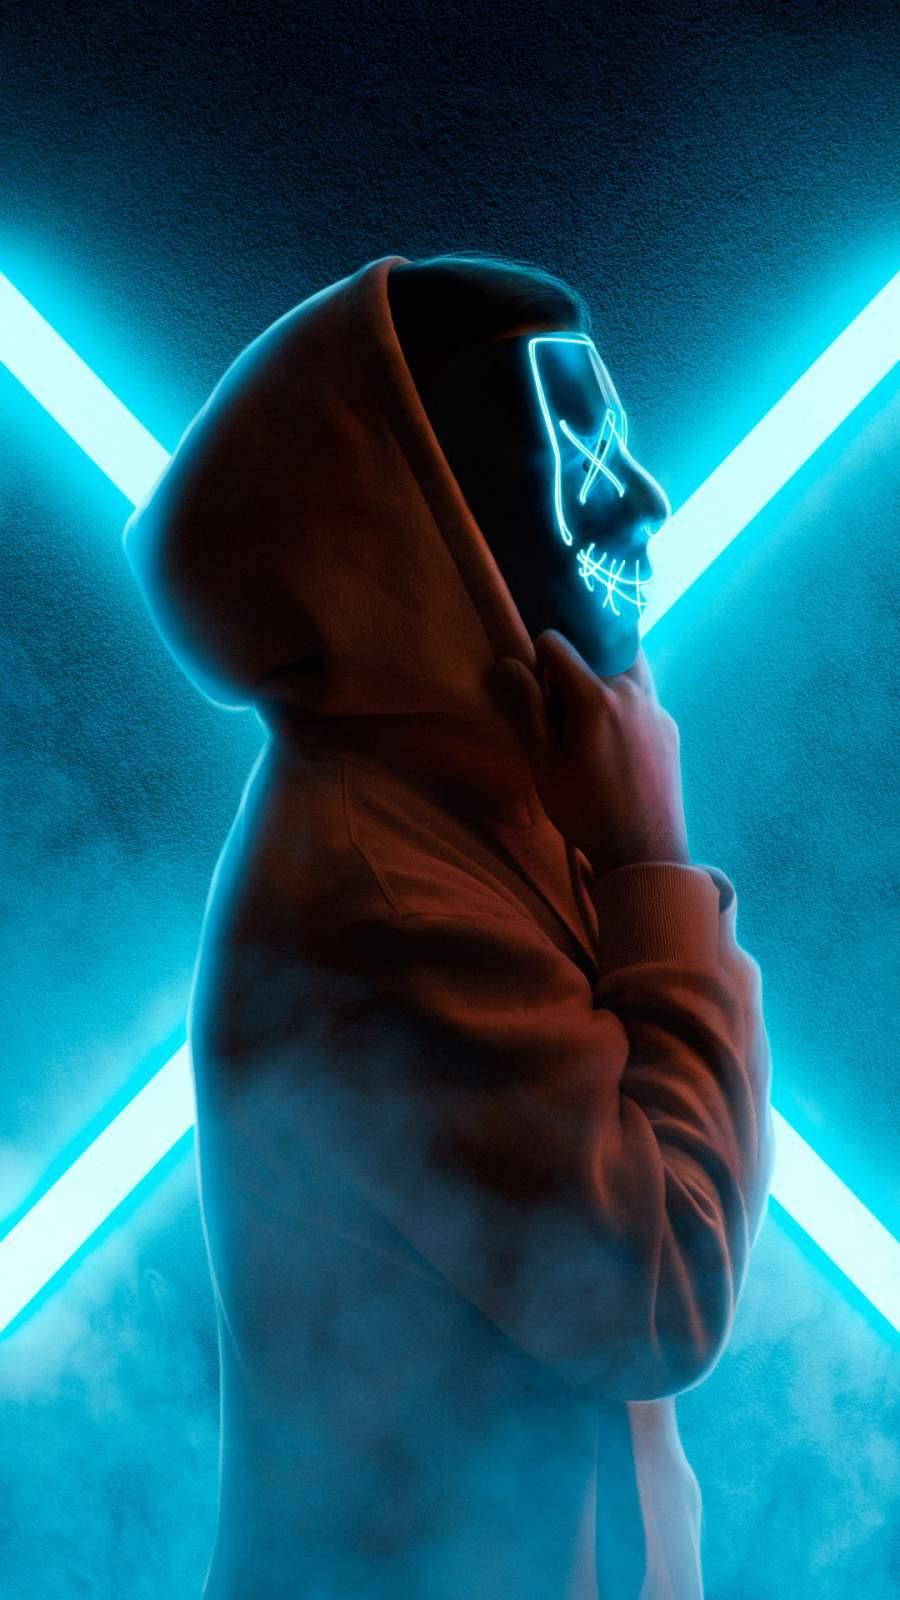 Neon Mask Hoodie iPhone Wallpaper